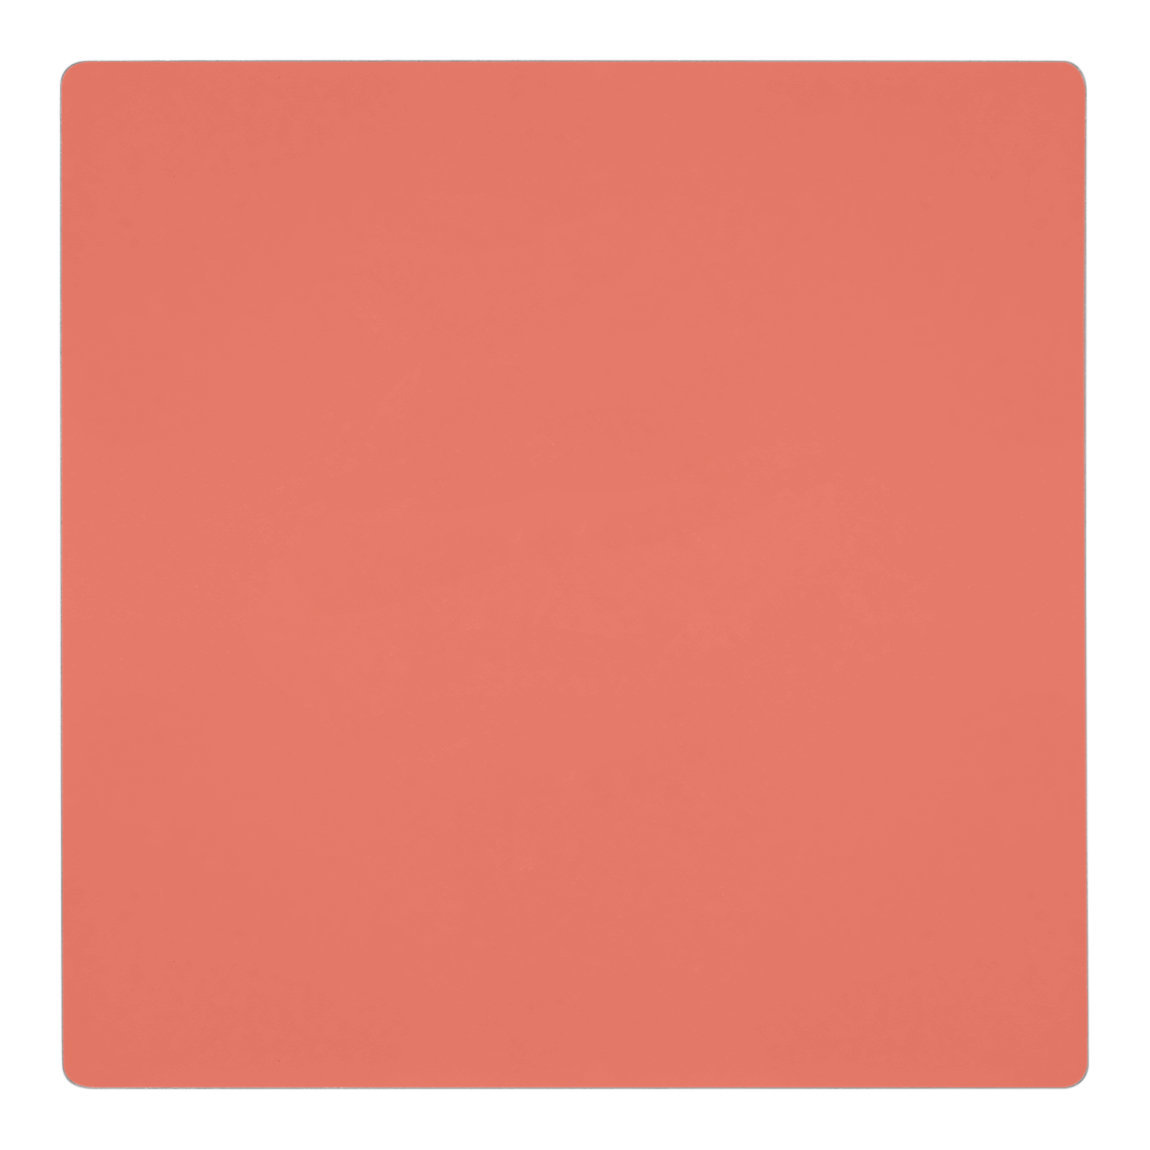 Kjaer Weis Cream Blush Refill Blossoming